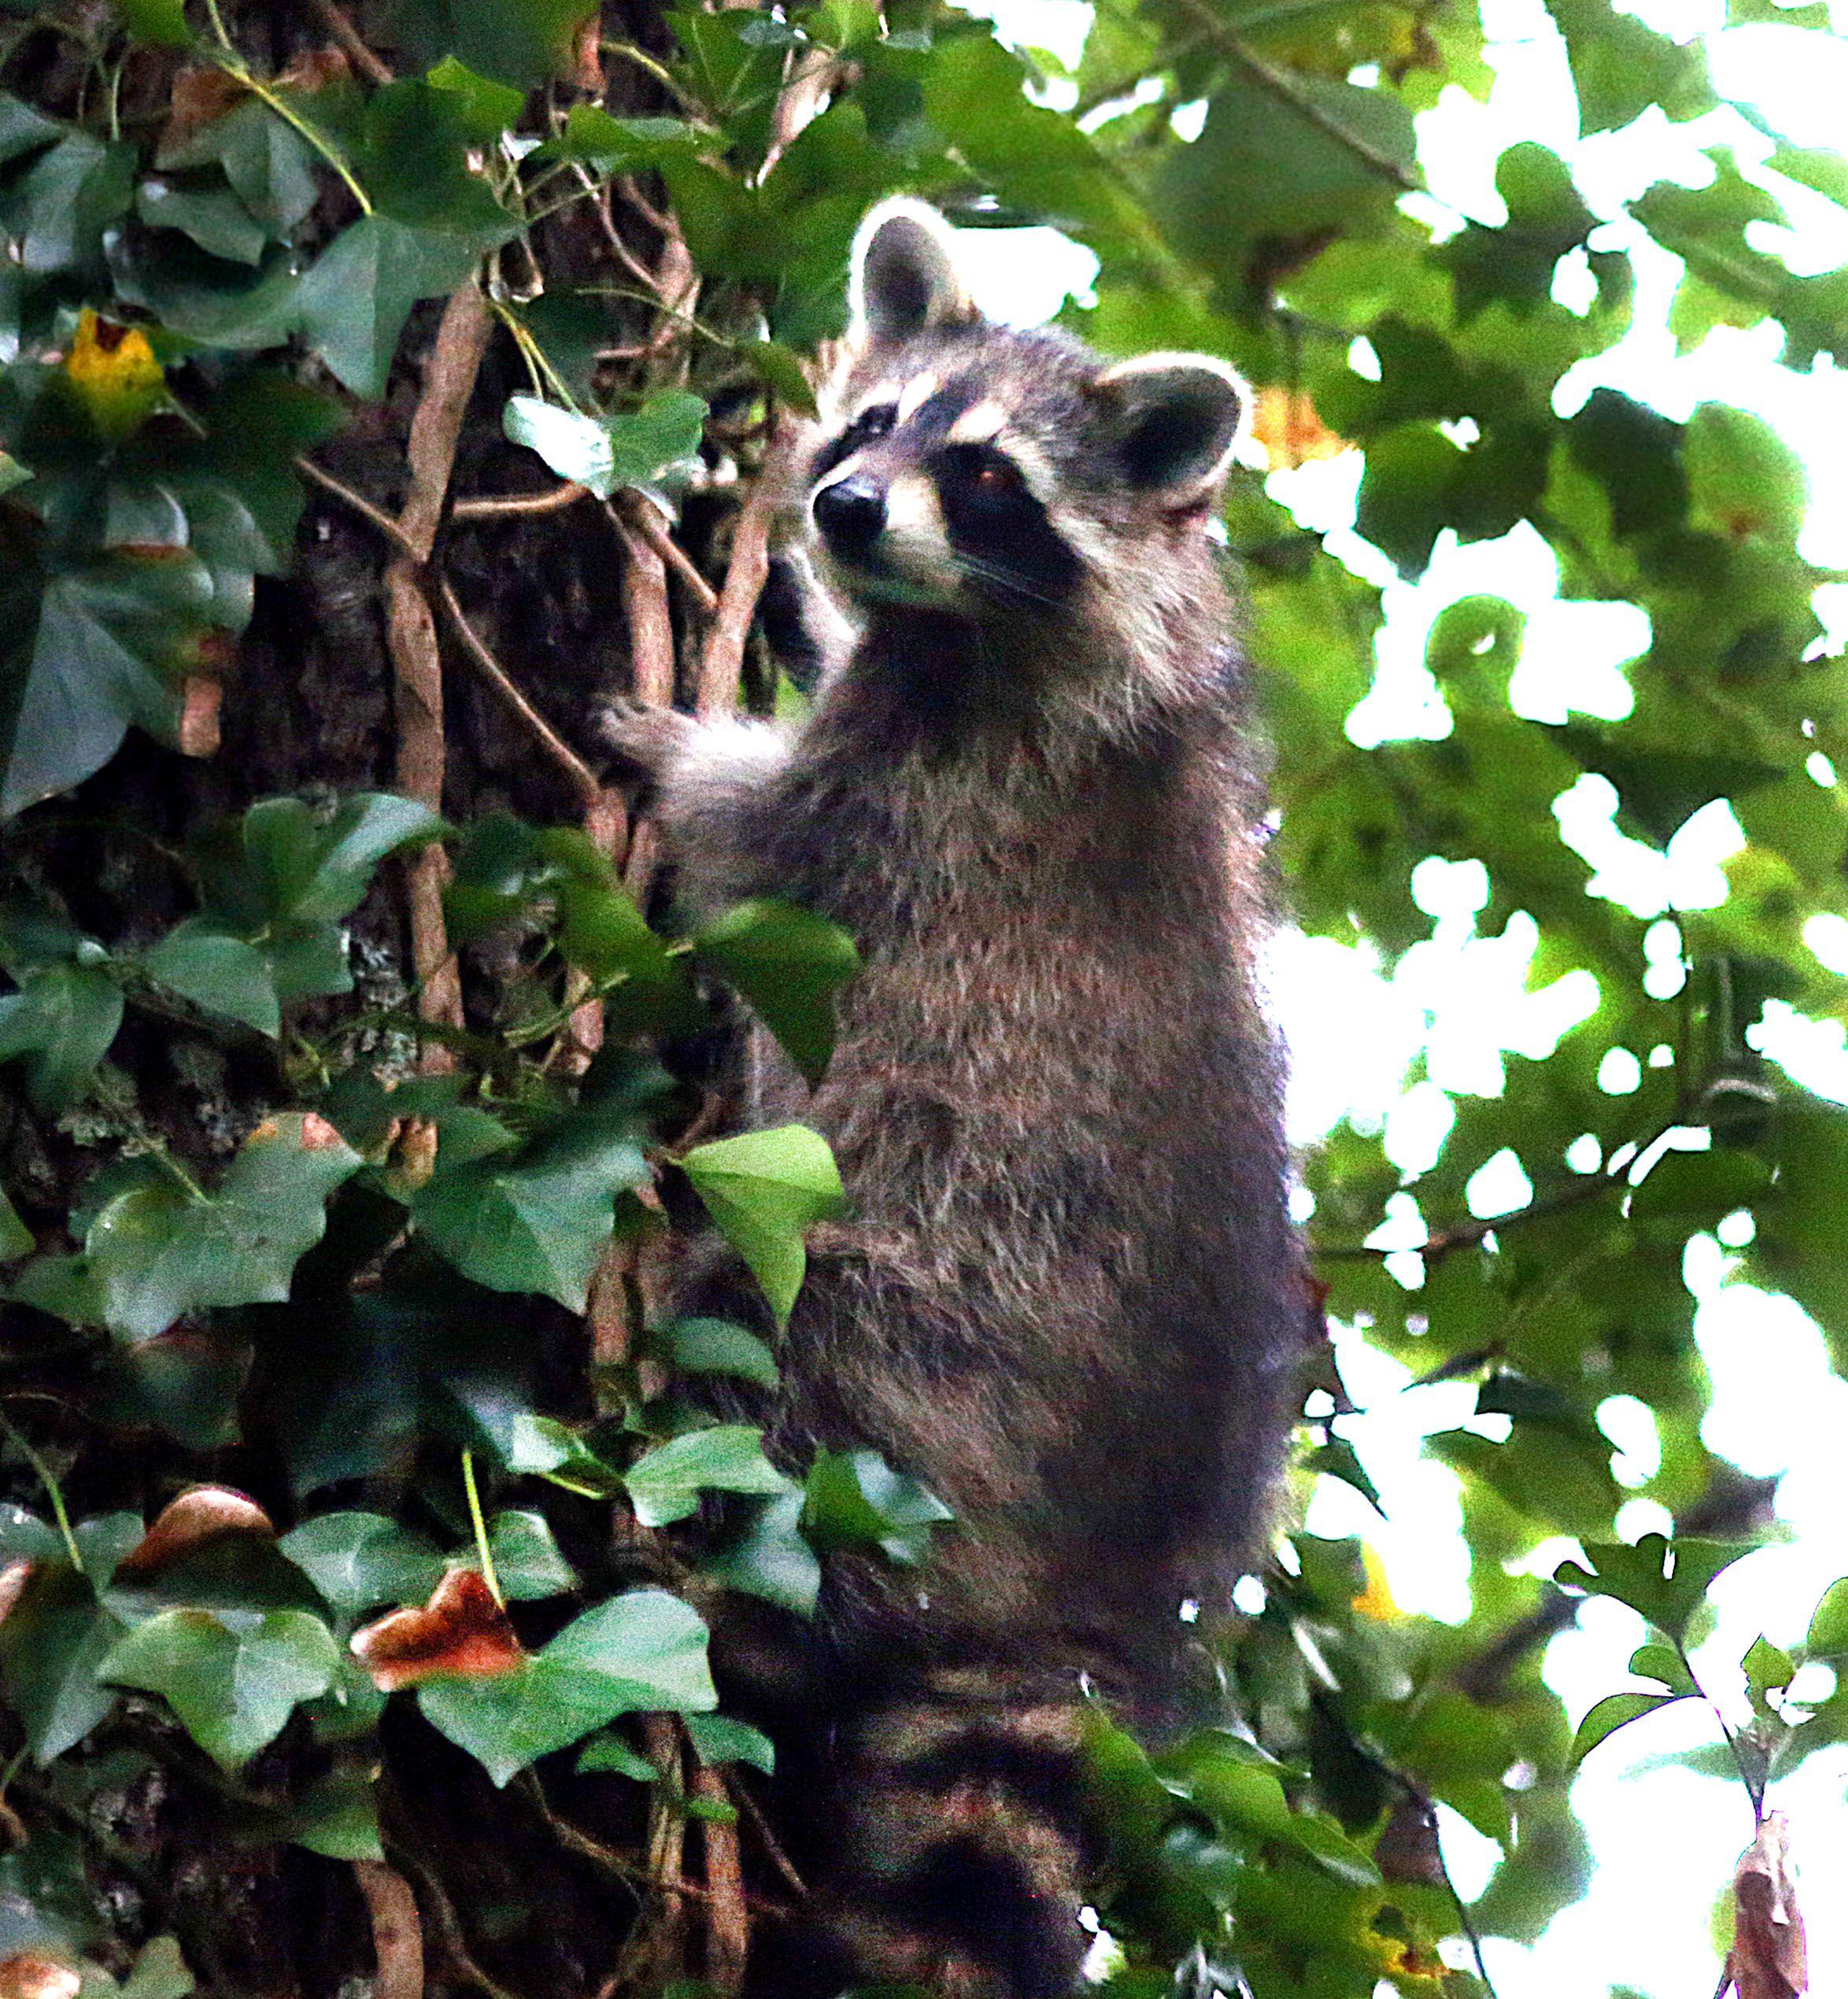 Hey, there's a raccoon on my leg - The Boston Globe